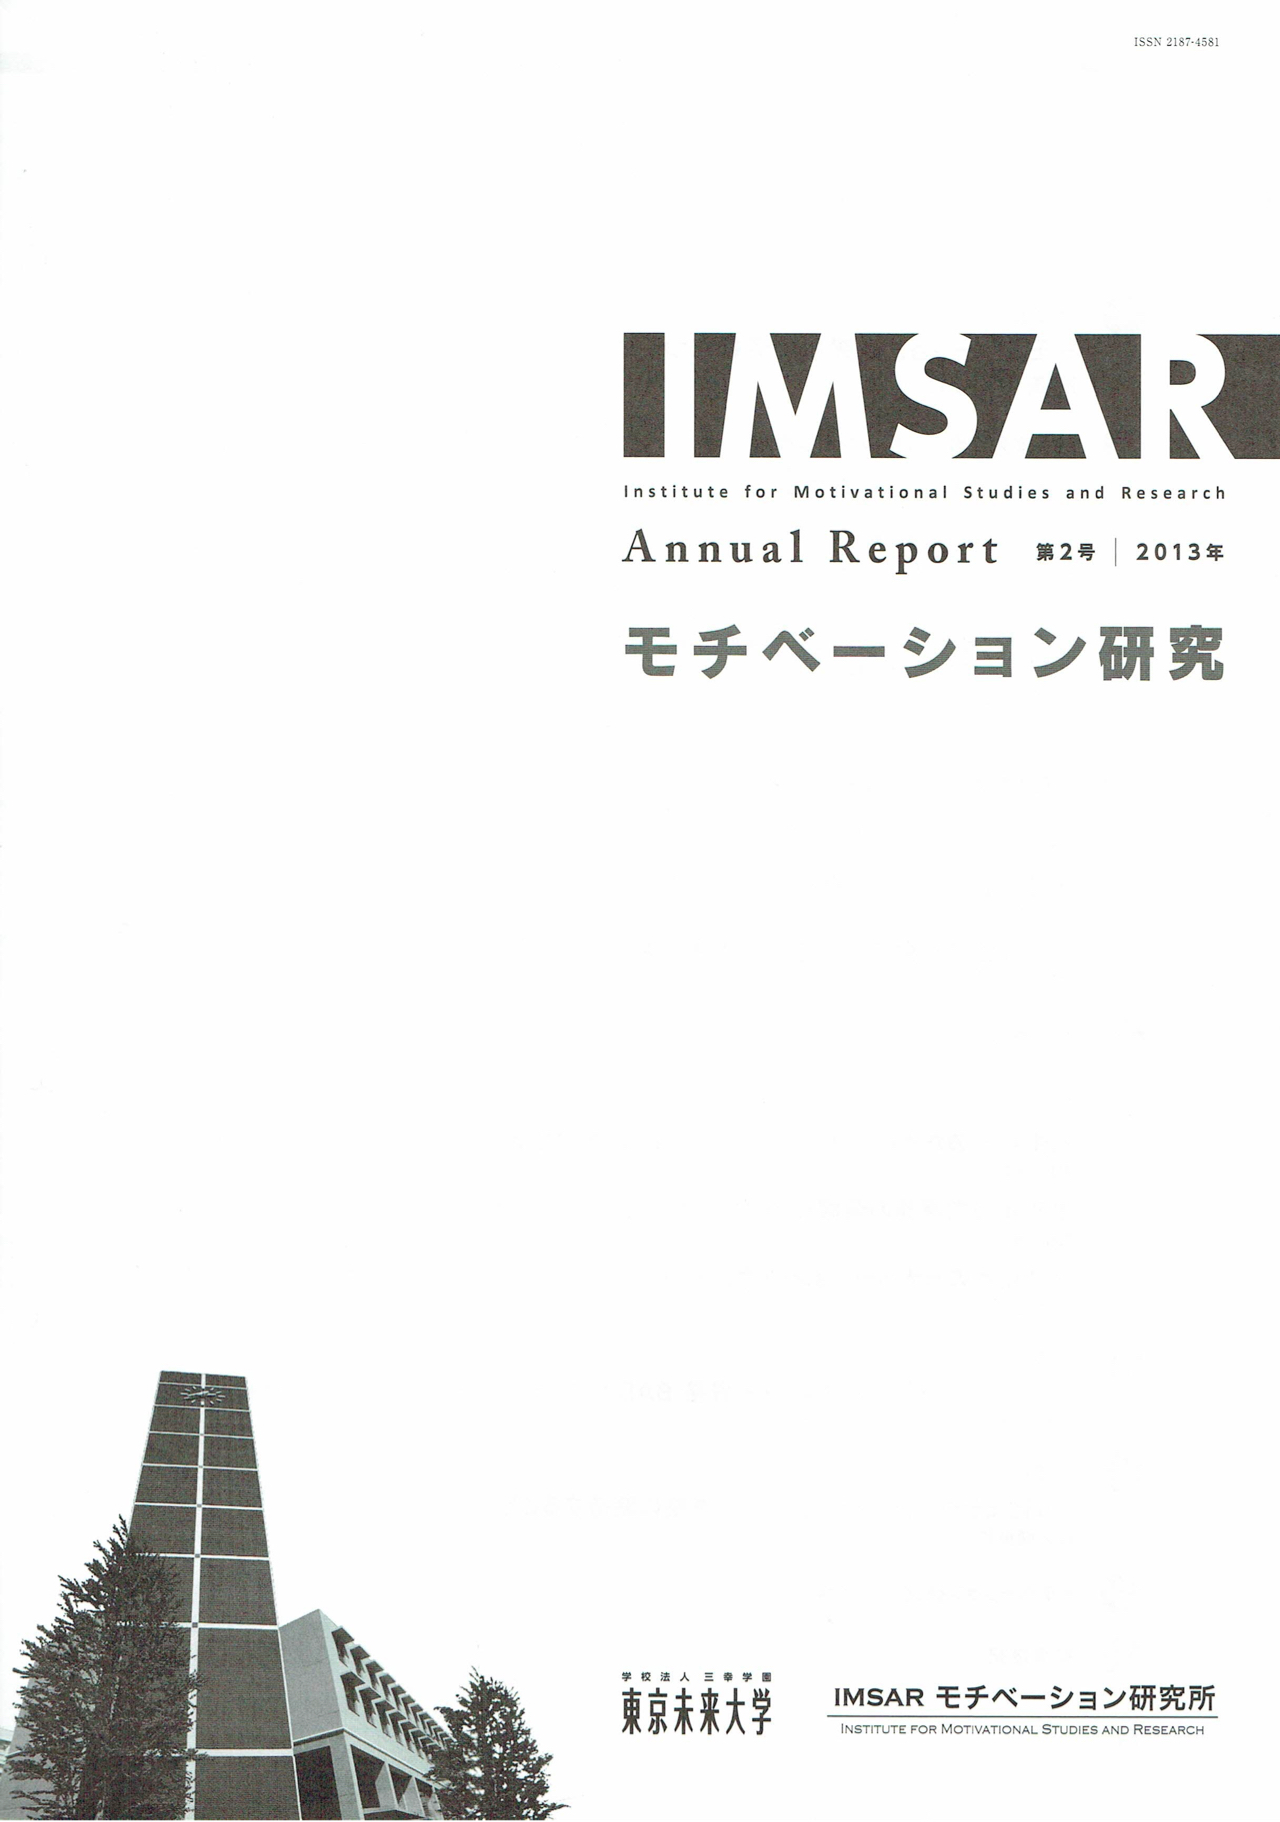 IMSARモチベーション研究所 投稿論文表紙